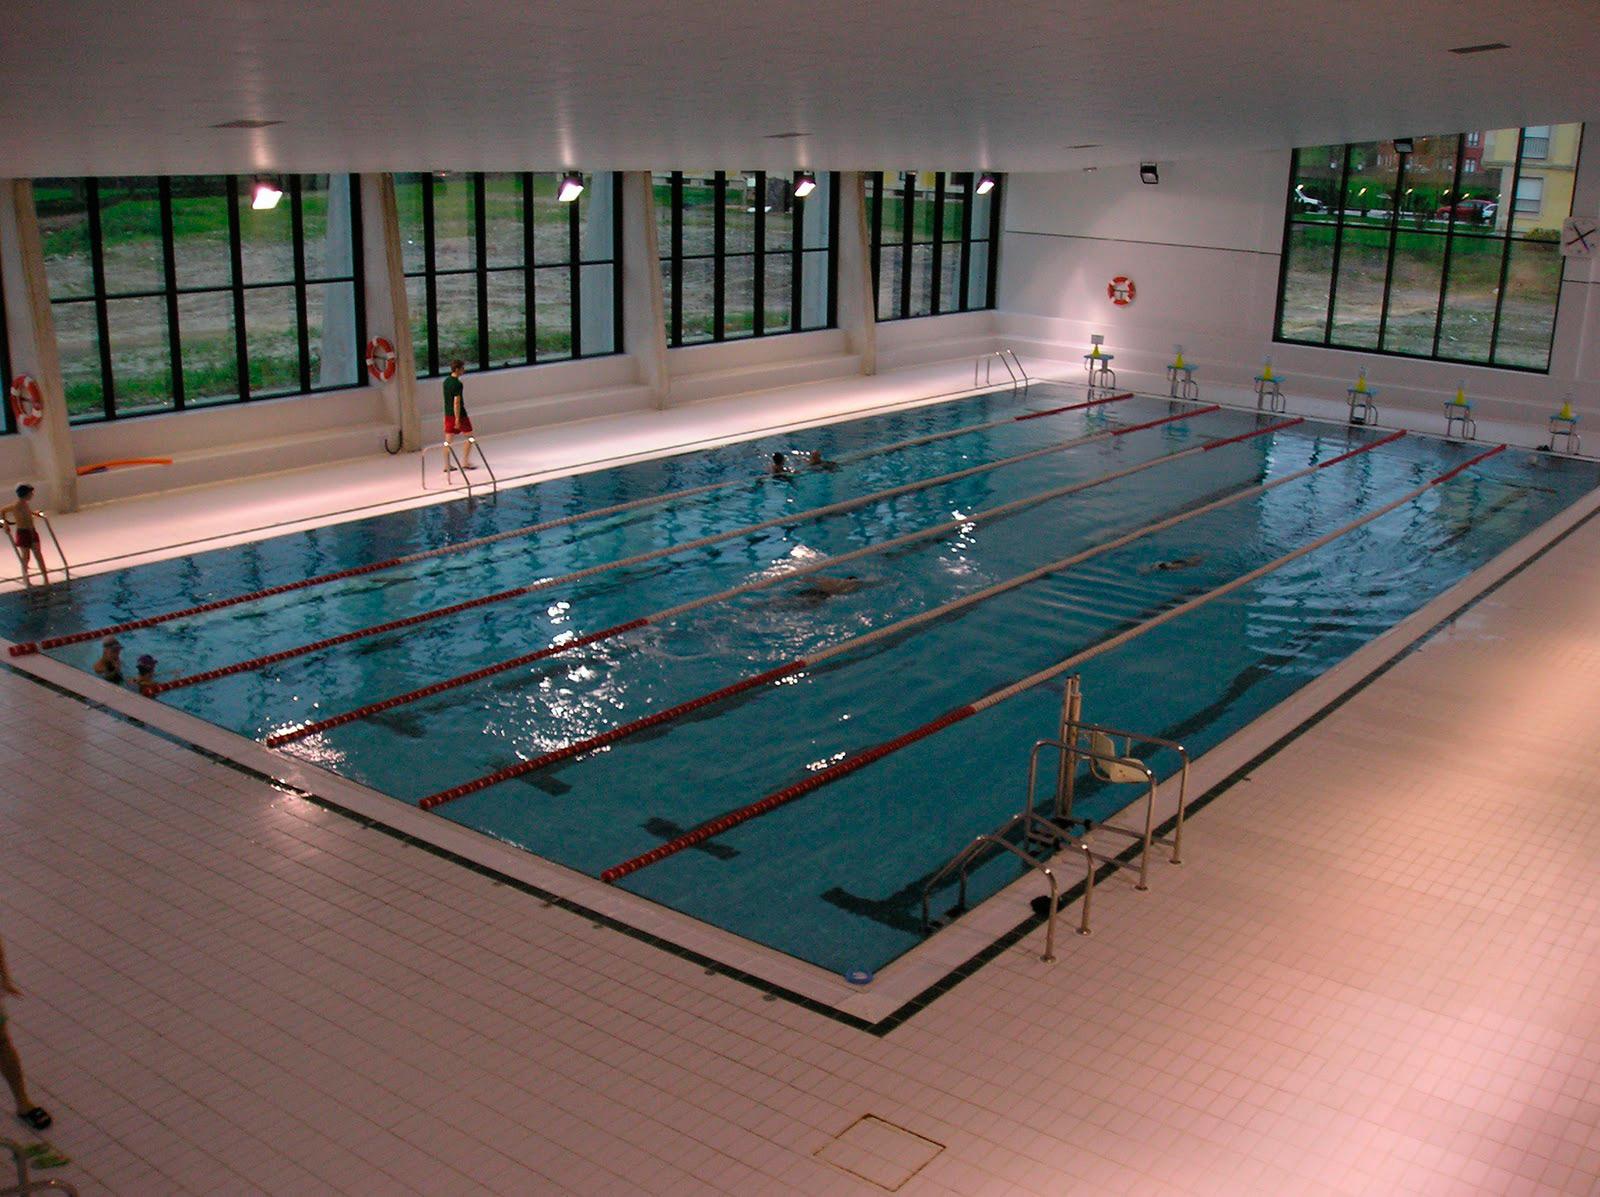 piscina pedro escudero 25m consello municipal de deportes